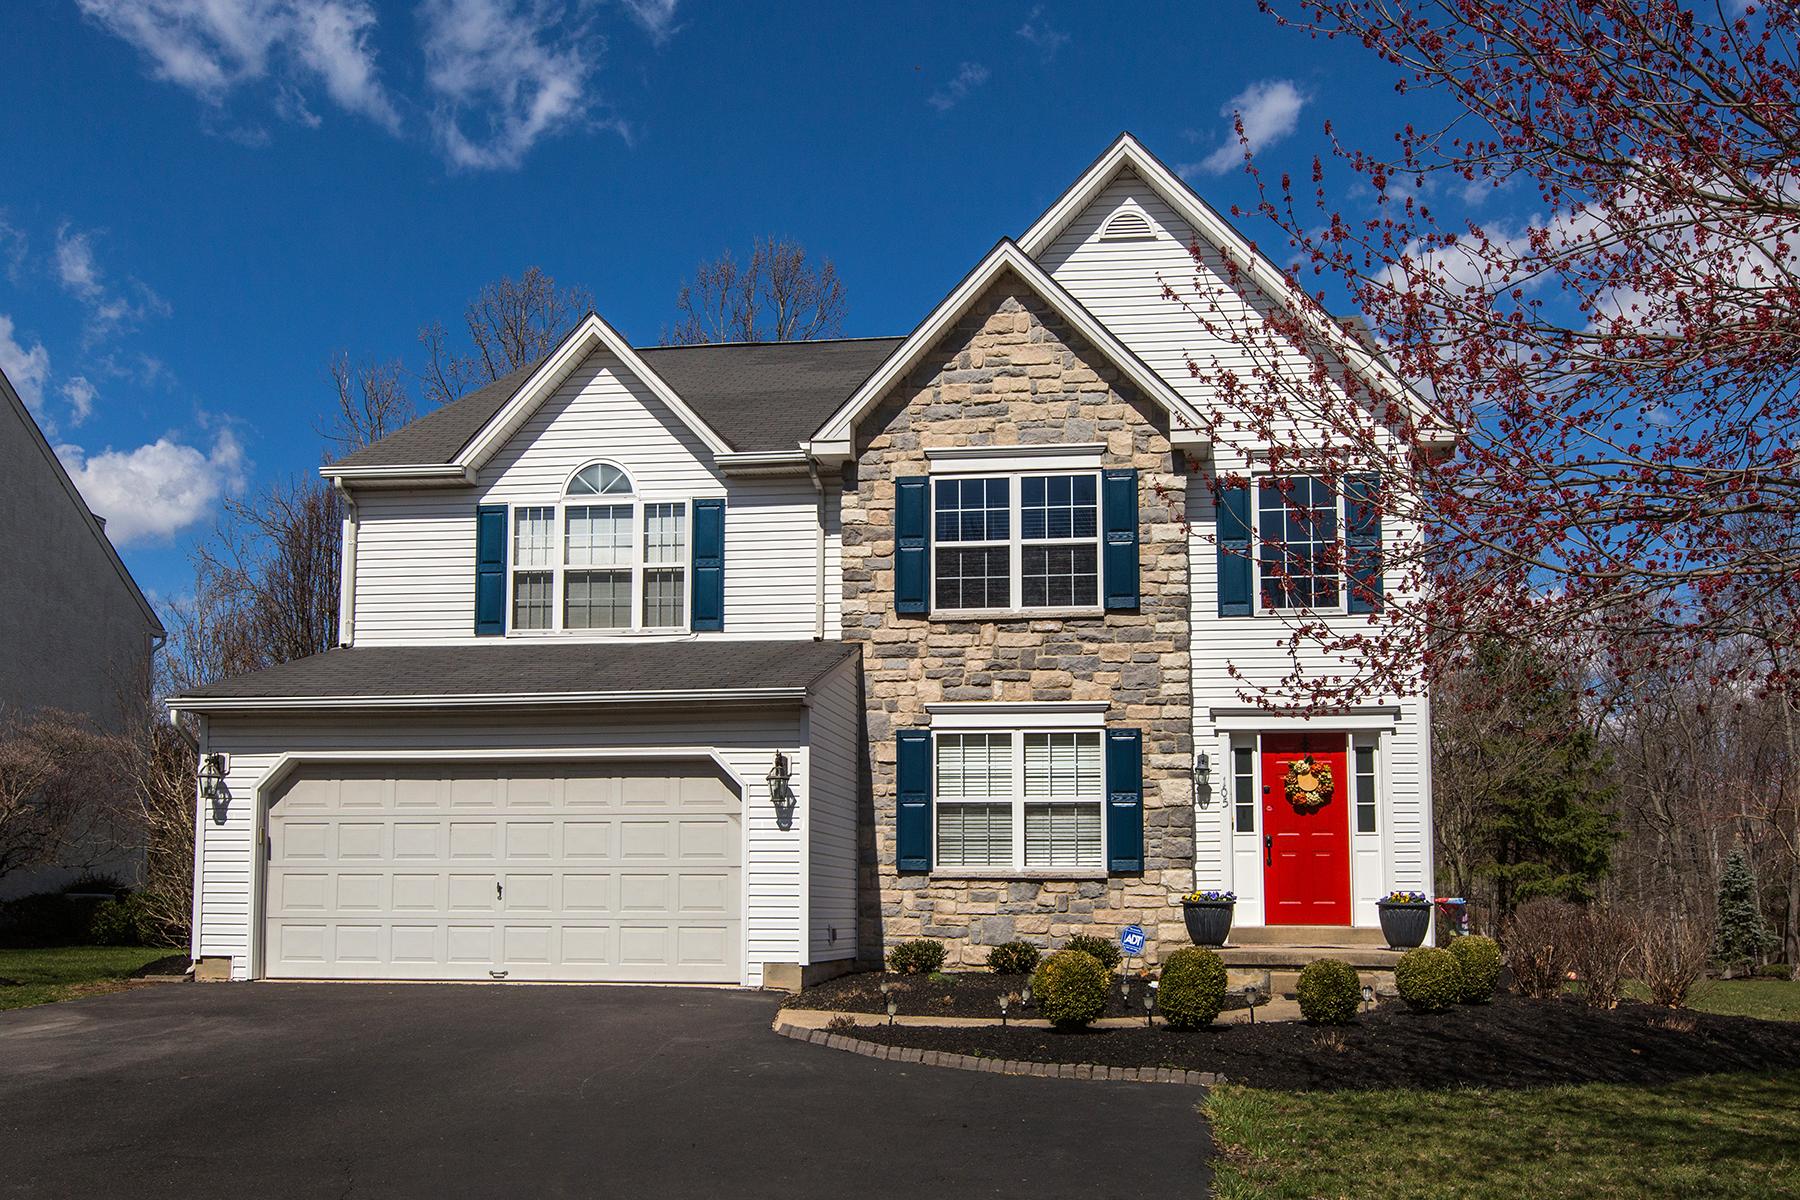 獨棟家庭住宅 為 出售 在 New Hope, PA 105 Riverwoods Drive New Hope, 賓夕法尼亞州, 18938 美國